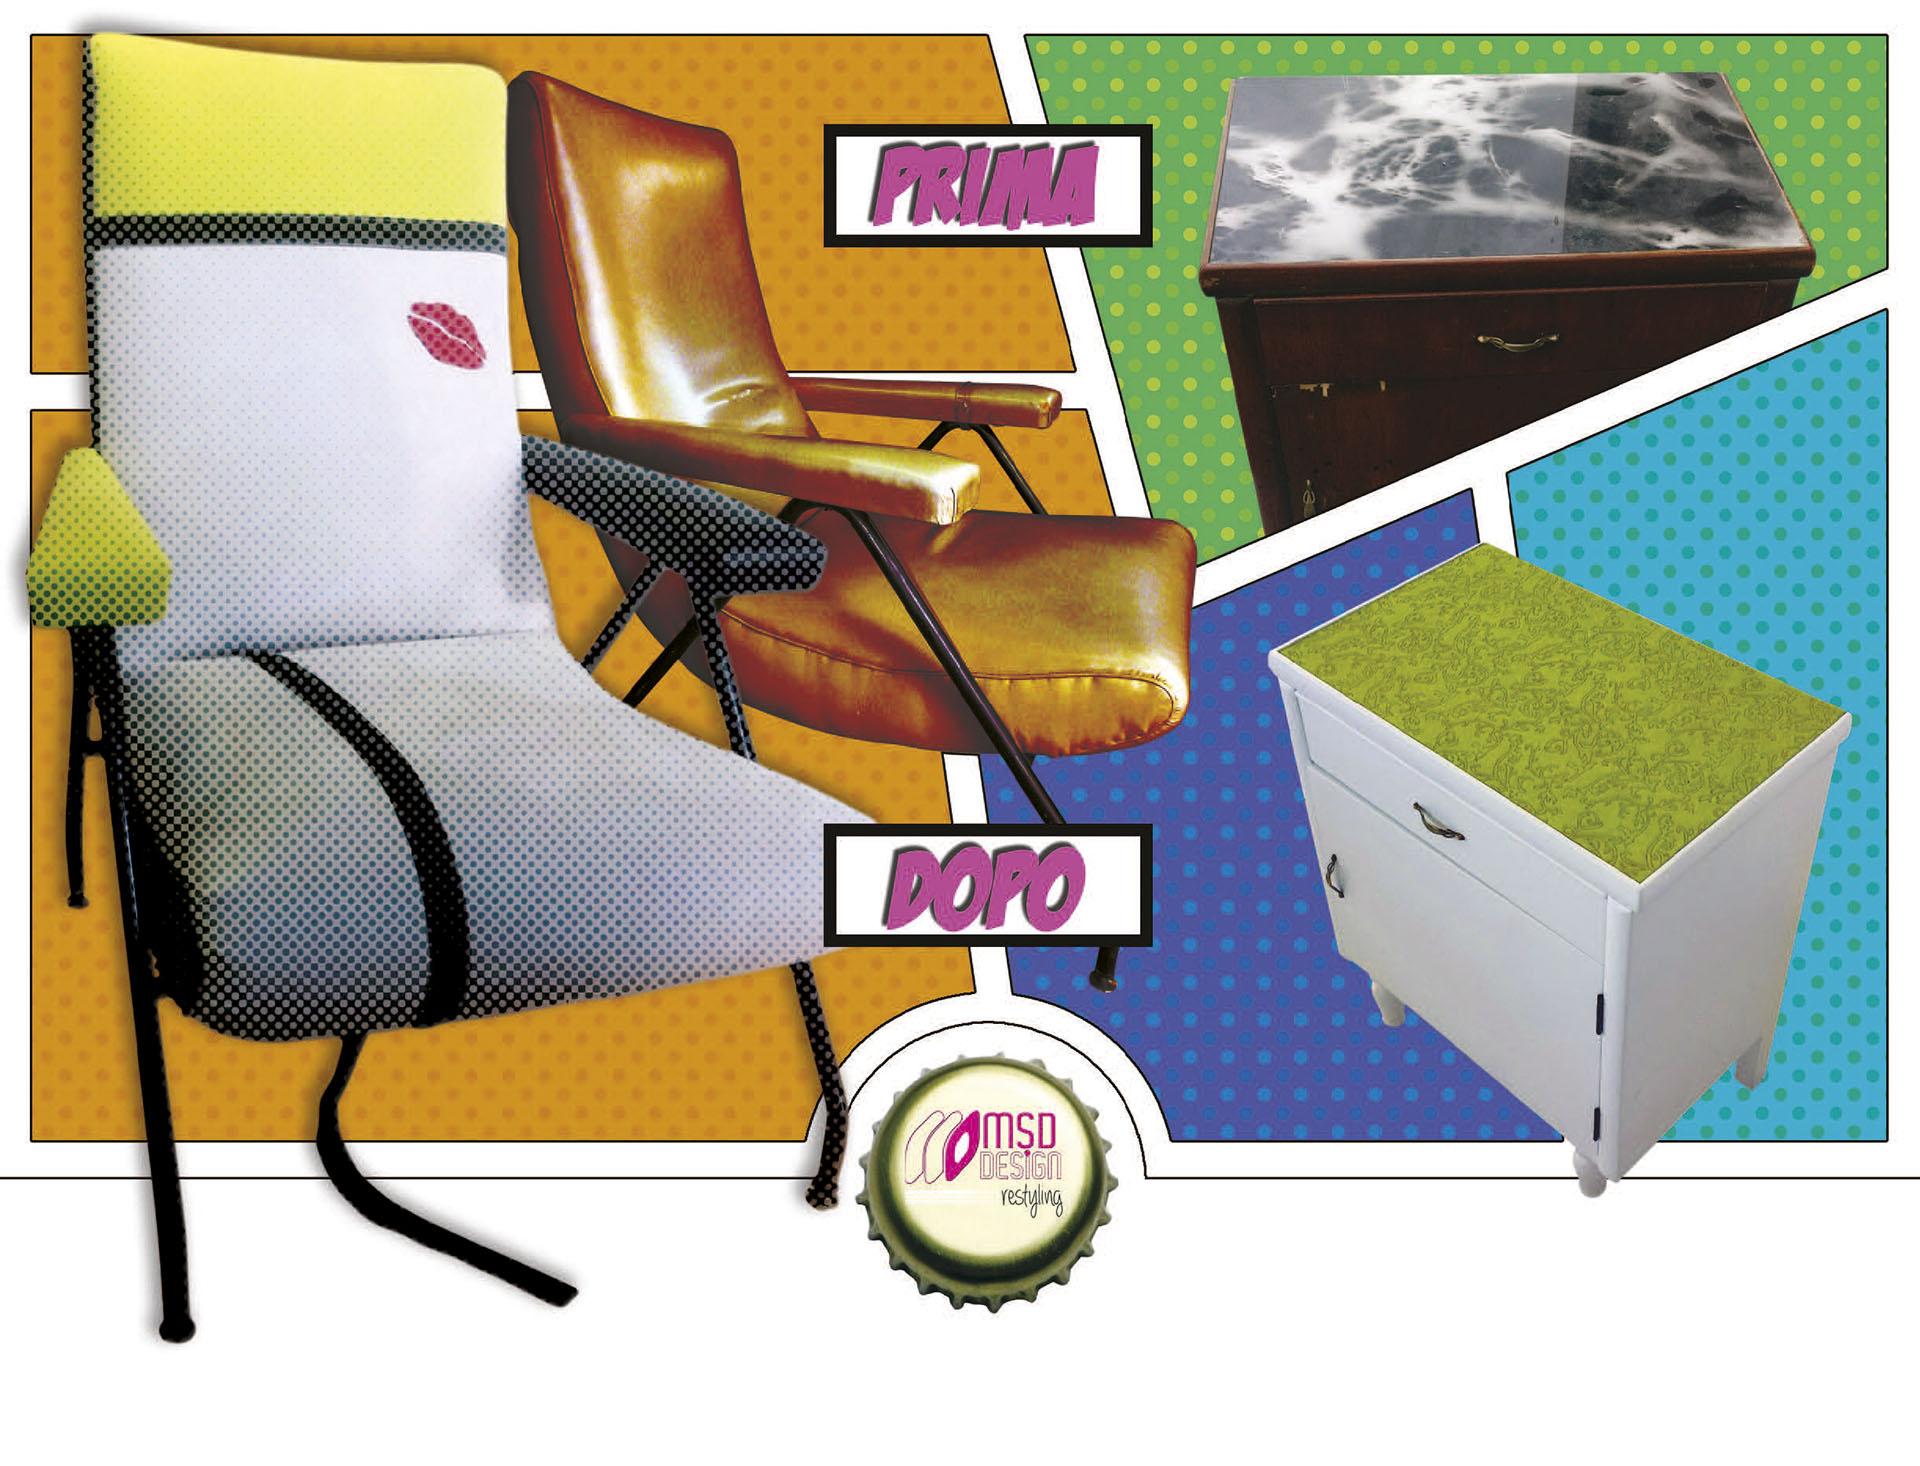 MSD articolo restyling - Home